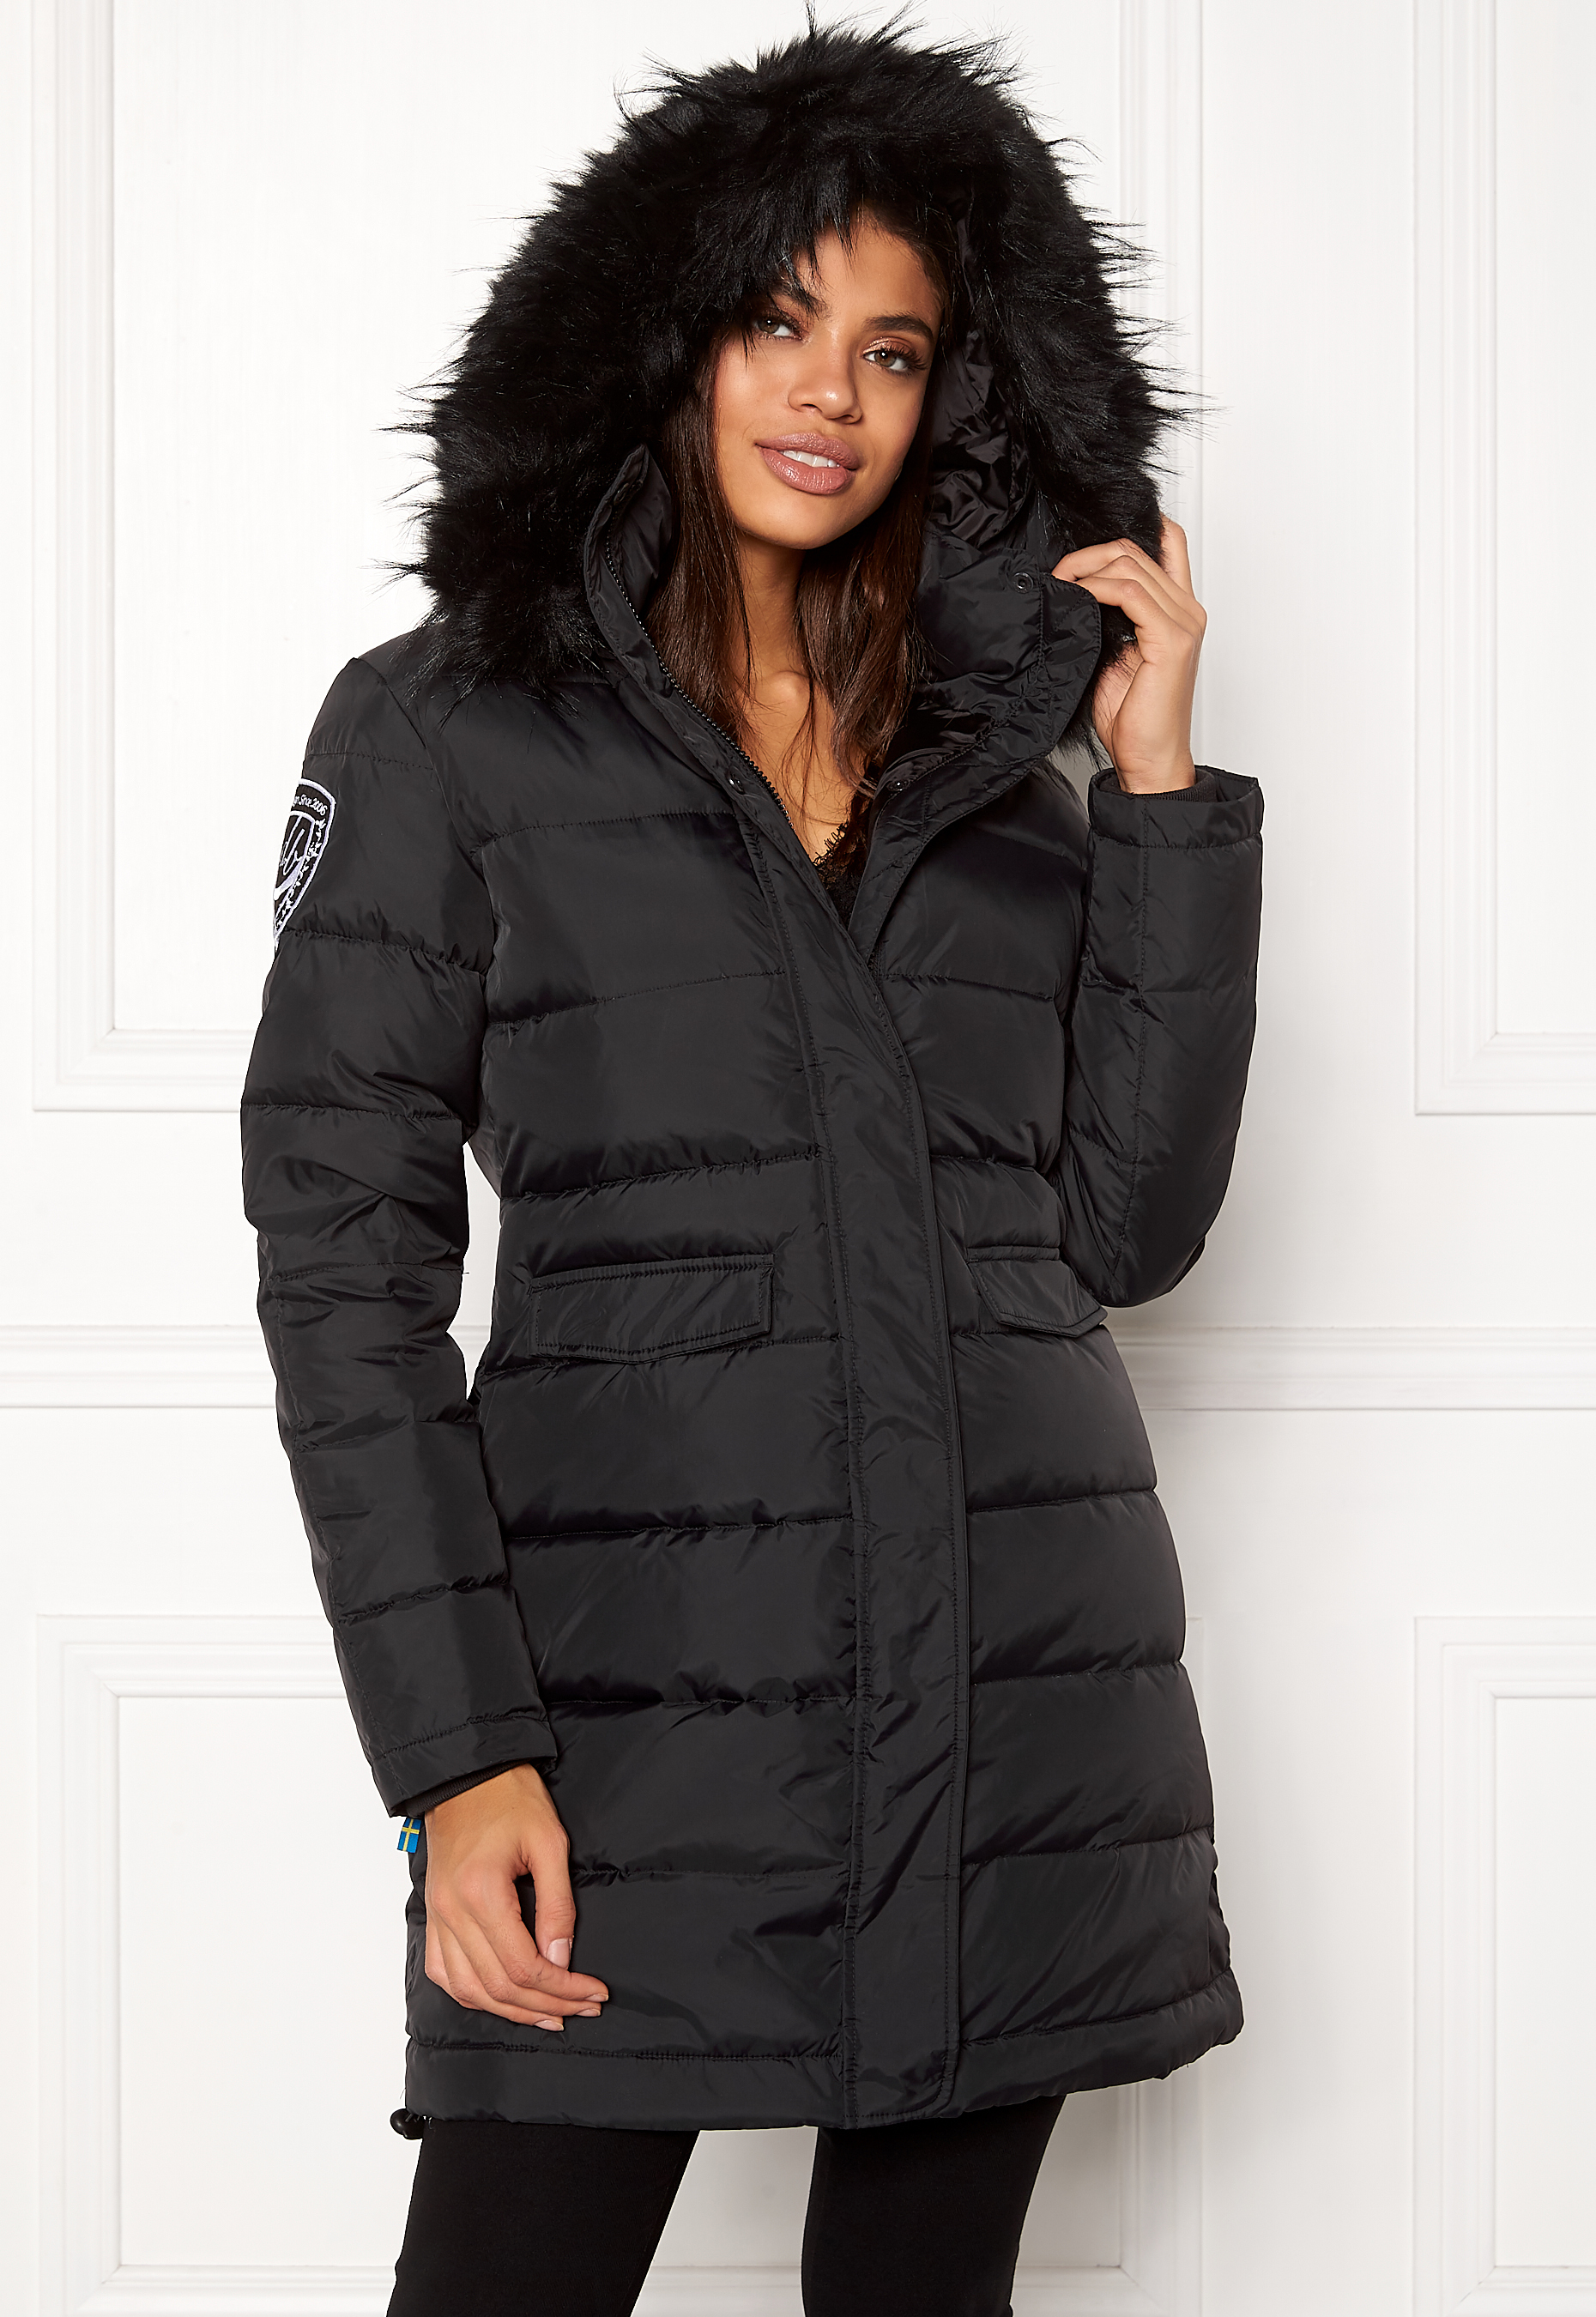 D.Brand Eskimå Jacket BlackBlack Bubbleroom